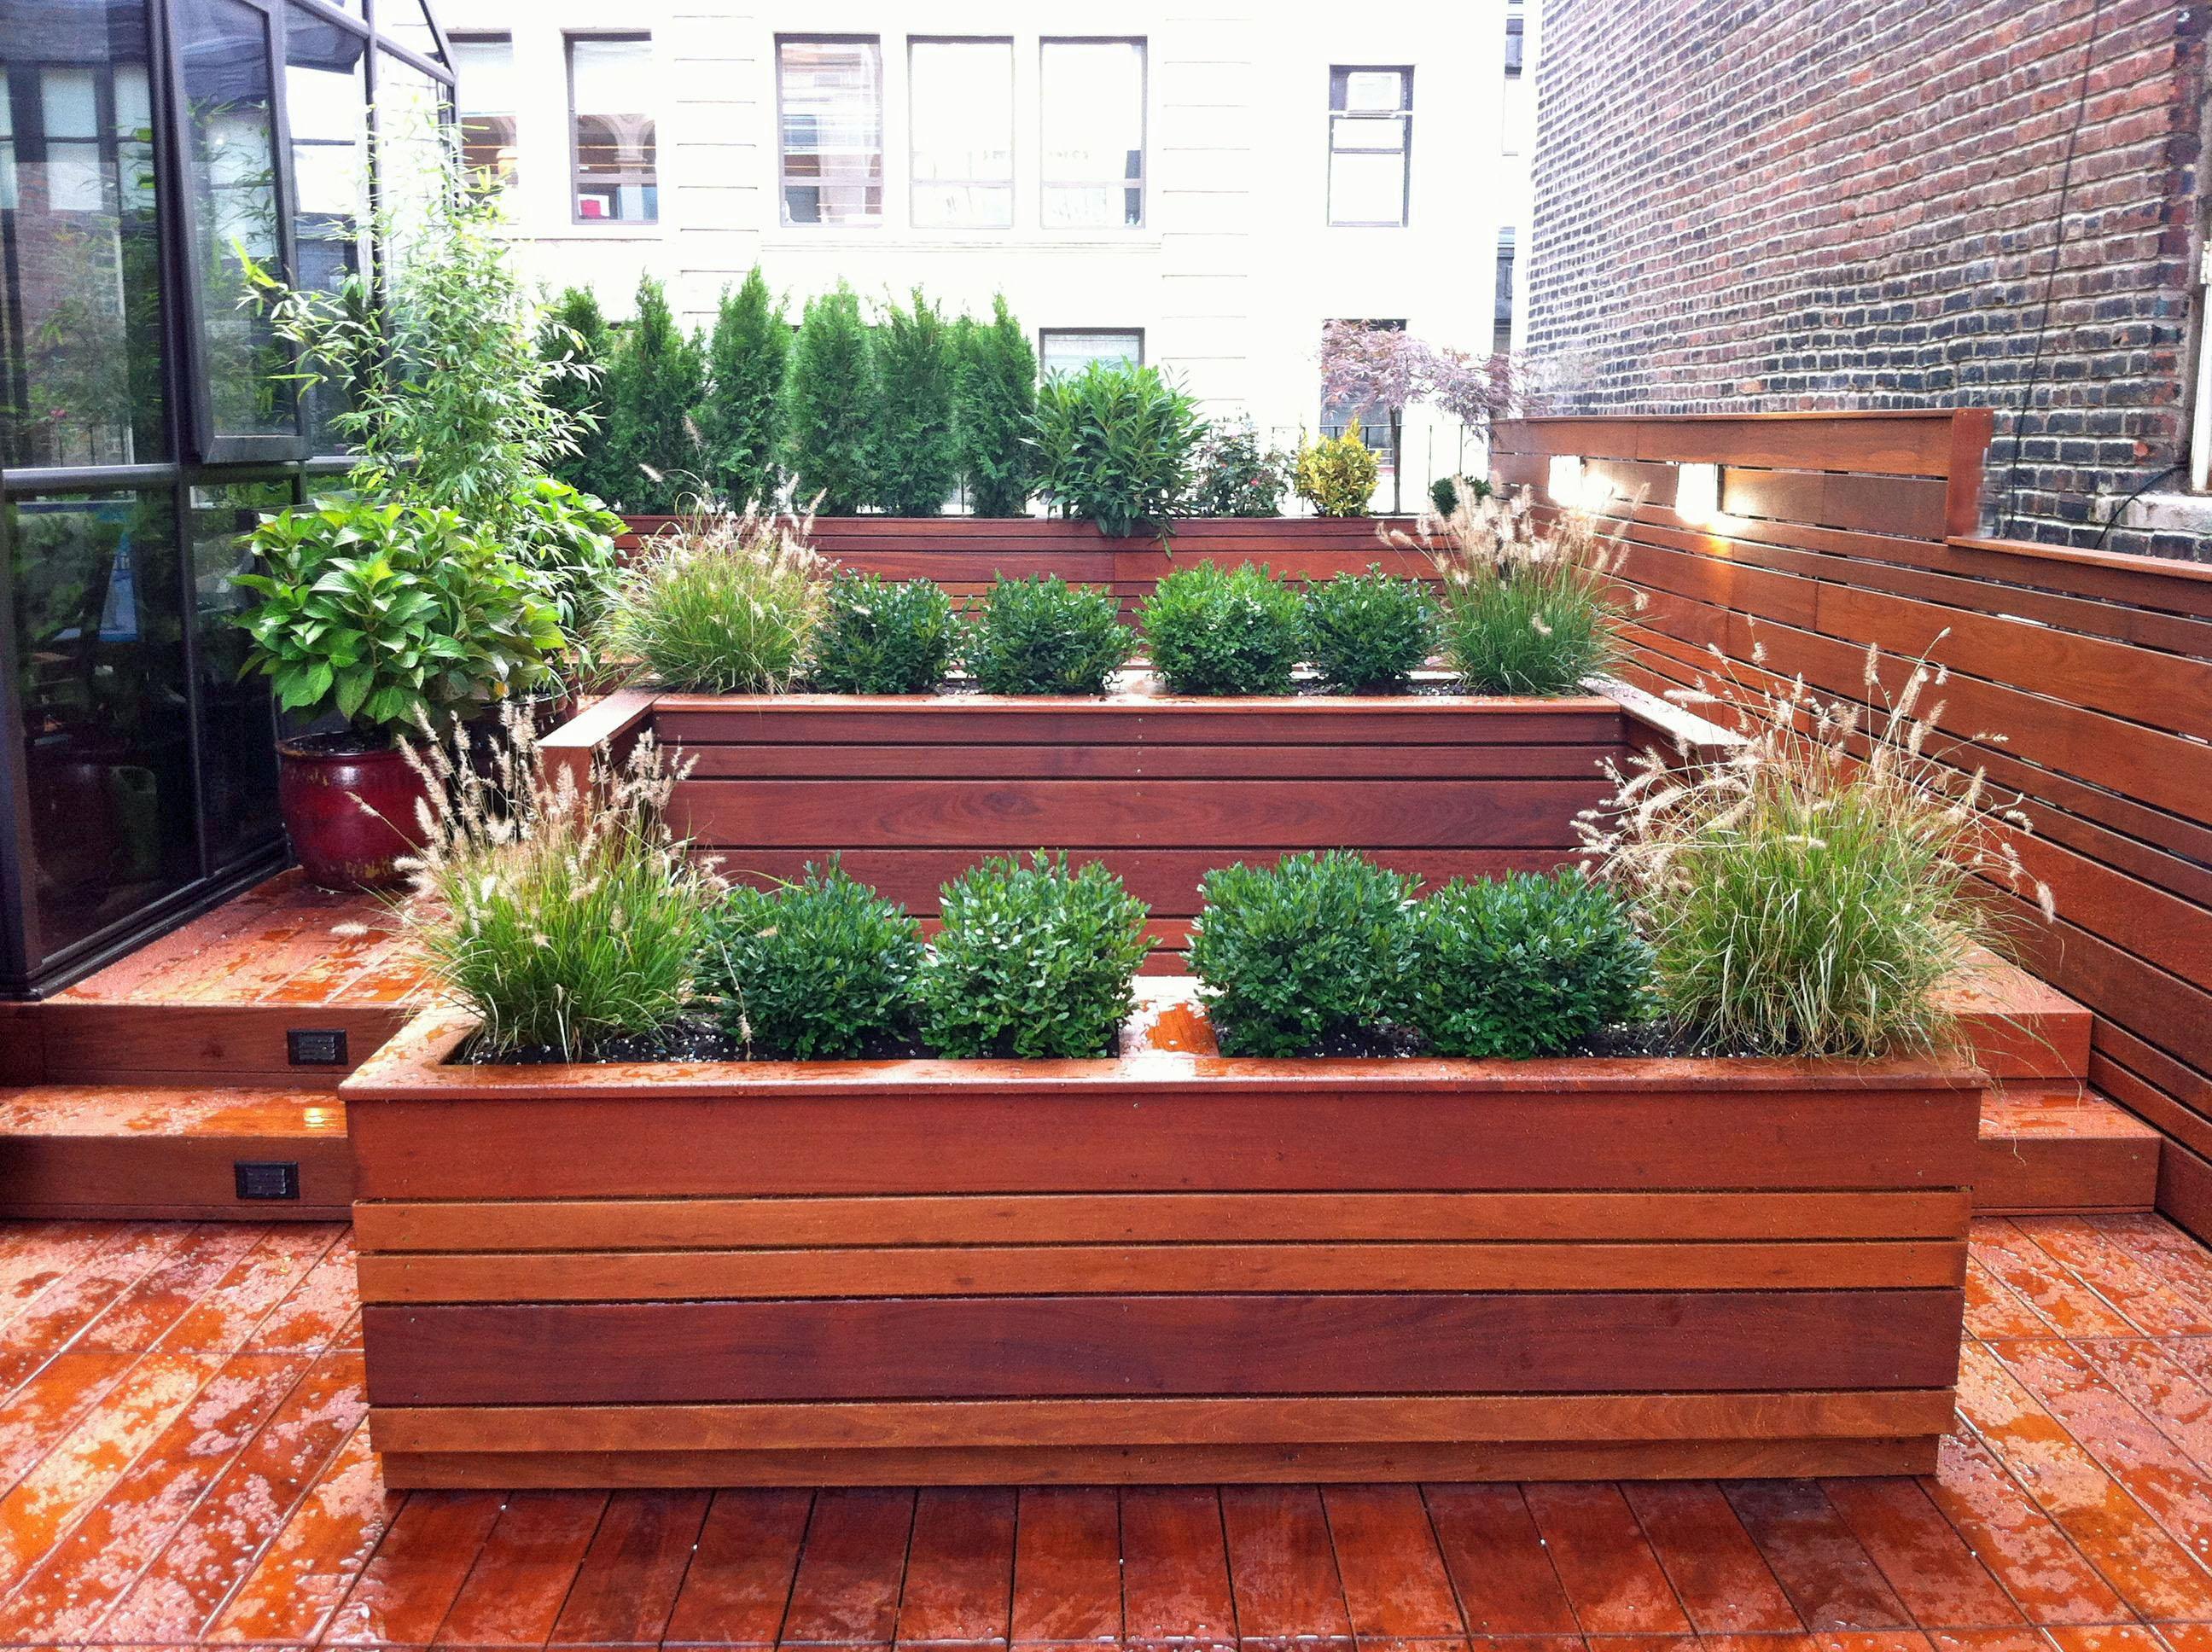 NYC Roof Garden Contemporary Design